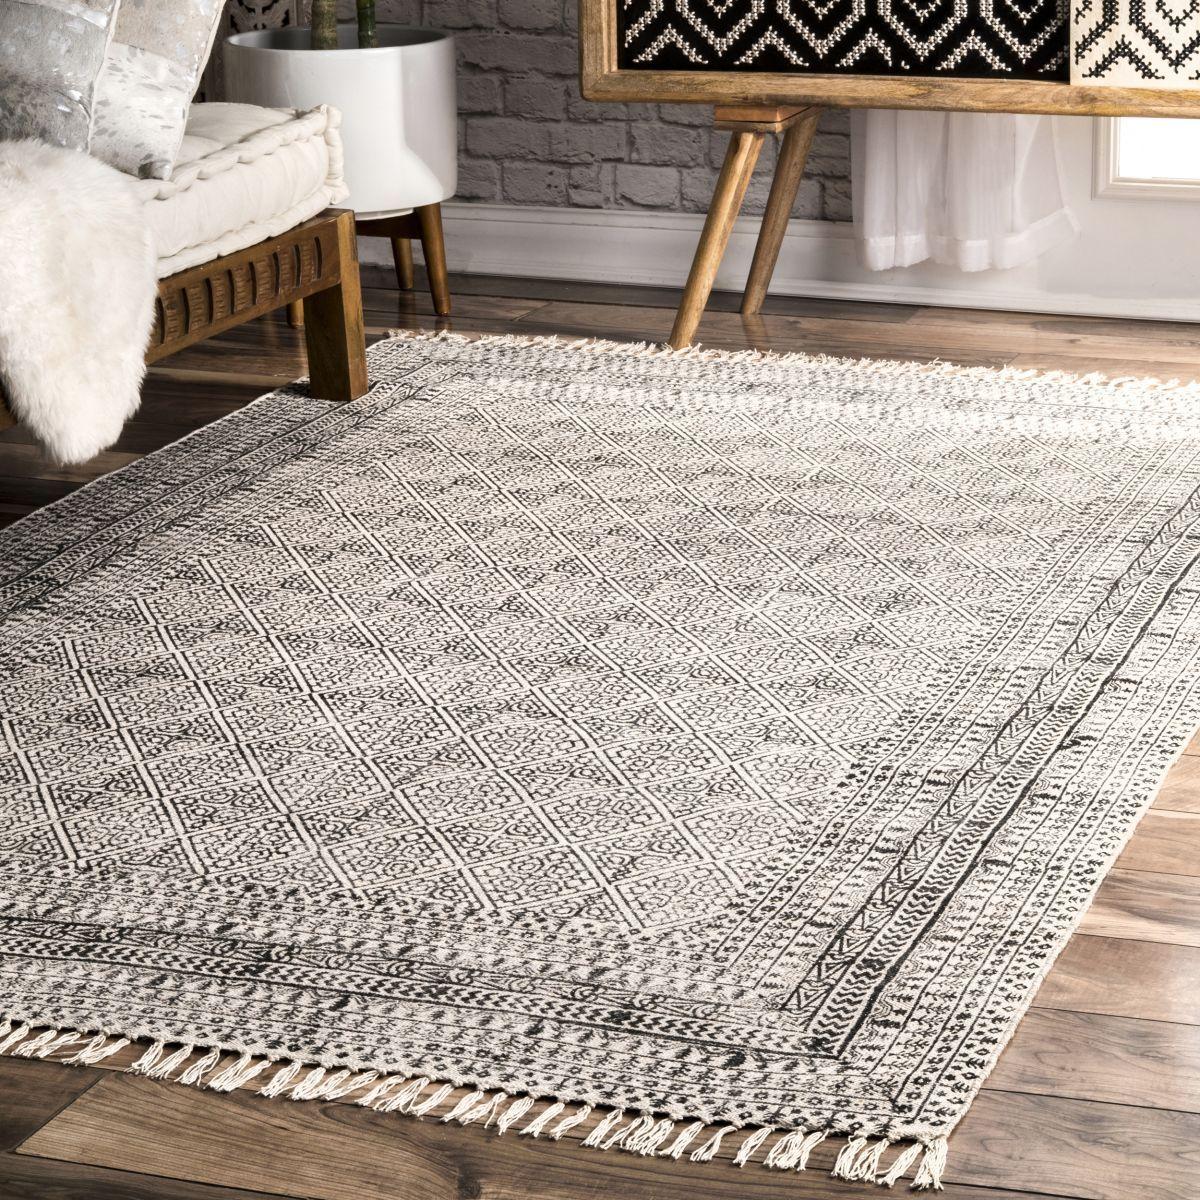 60 Best Carpet Tiles Ideas For Your Dream House Enjoy Your Time Carpet Tiles Design Carpet Tiles Office Carpet Tiles